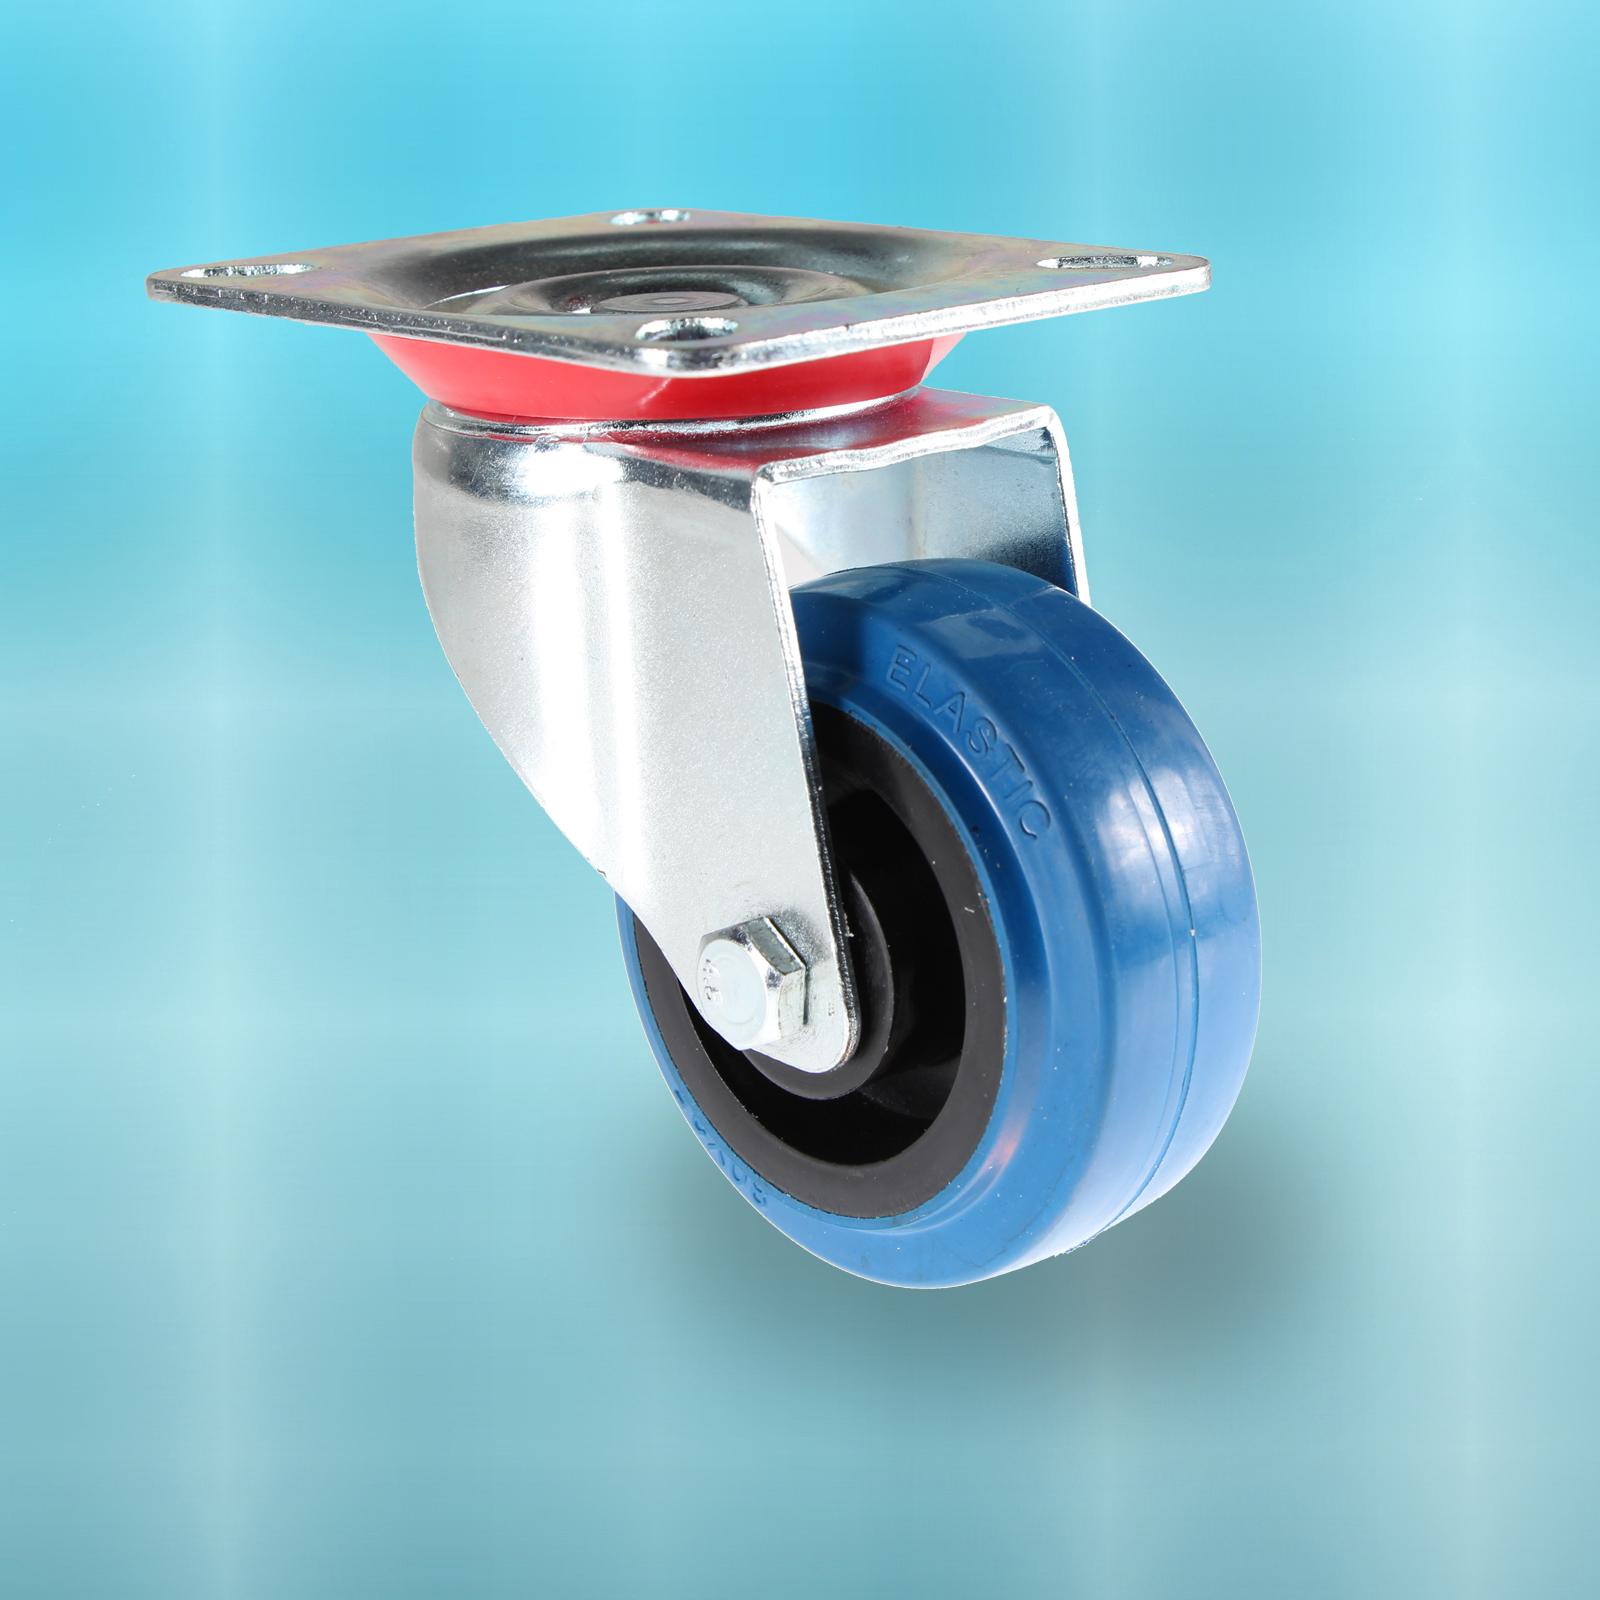 transportrollen blue wheel lenkrollen schwerlastrollen mit bremse 80 100 125 mm ebay. Black Bedroom Furniture Sets. Home Design Ideas